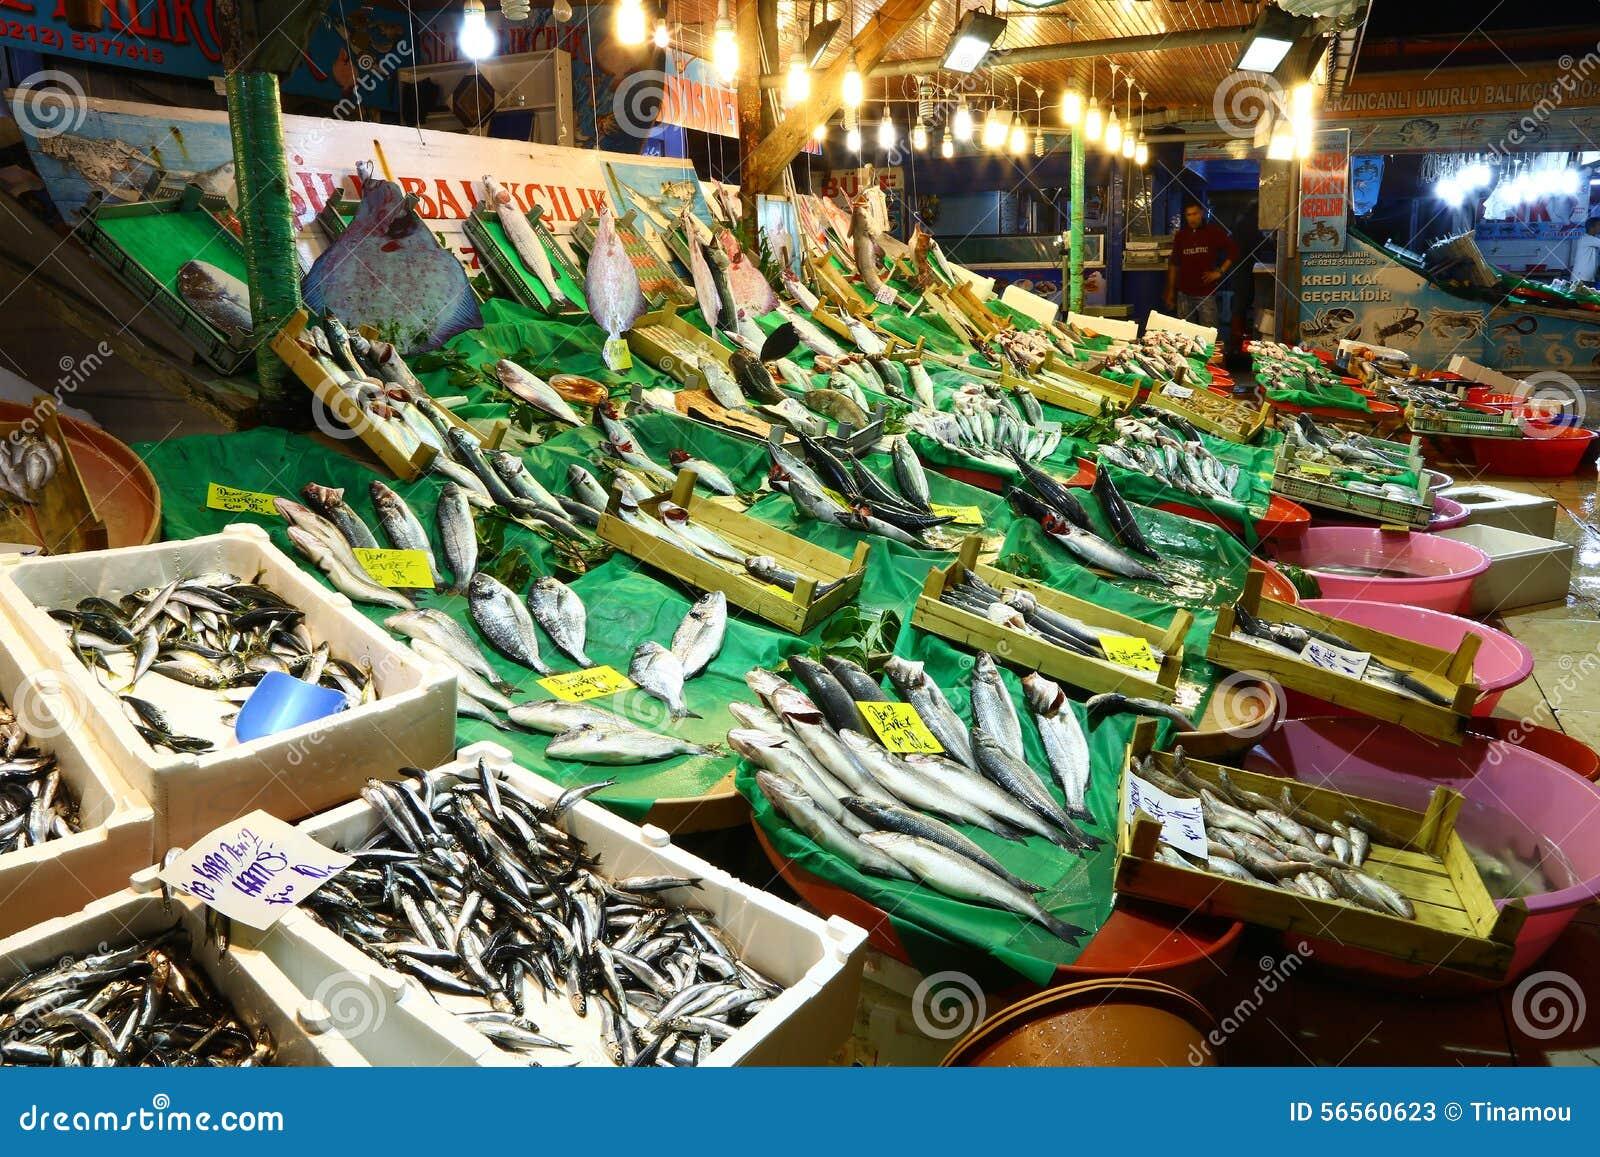 Download Νυκτερινή αγορά ψαριών στη Ιστανμπούλ, Τουρκία Εκδοτική Στοκ Εικόνες - εικόνα από τουρκία, τουρκικά: 56560623